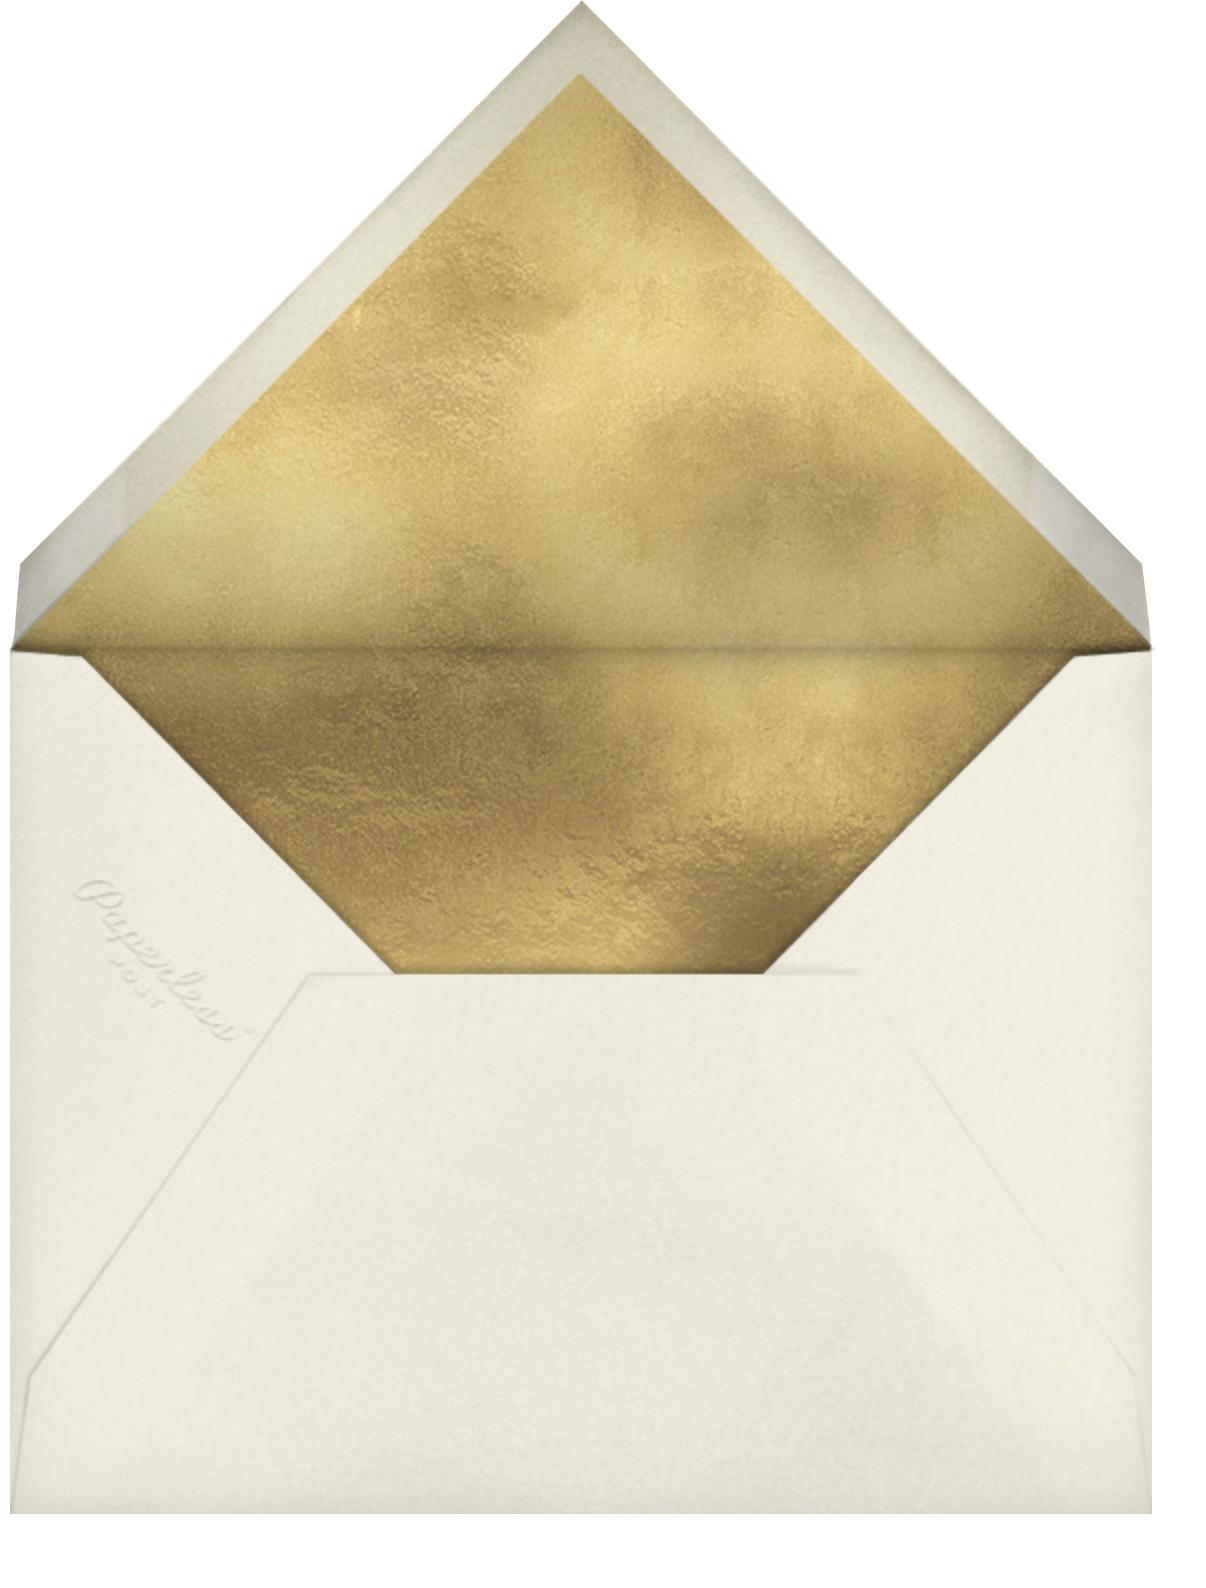 Folk Tails - Spruce - Anthropologie - Winter entertaining - envelope back